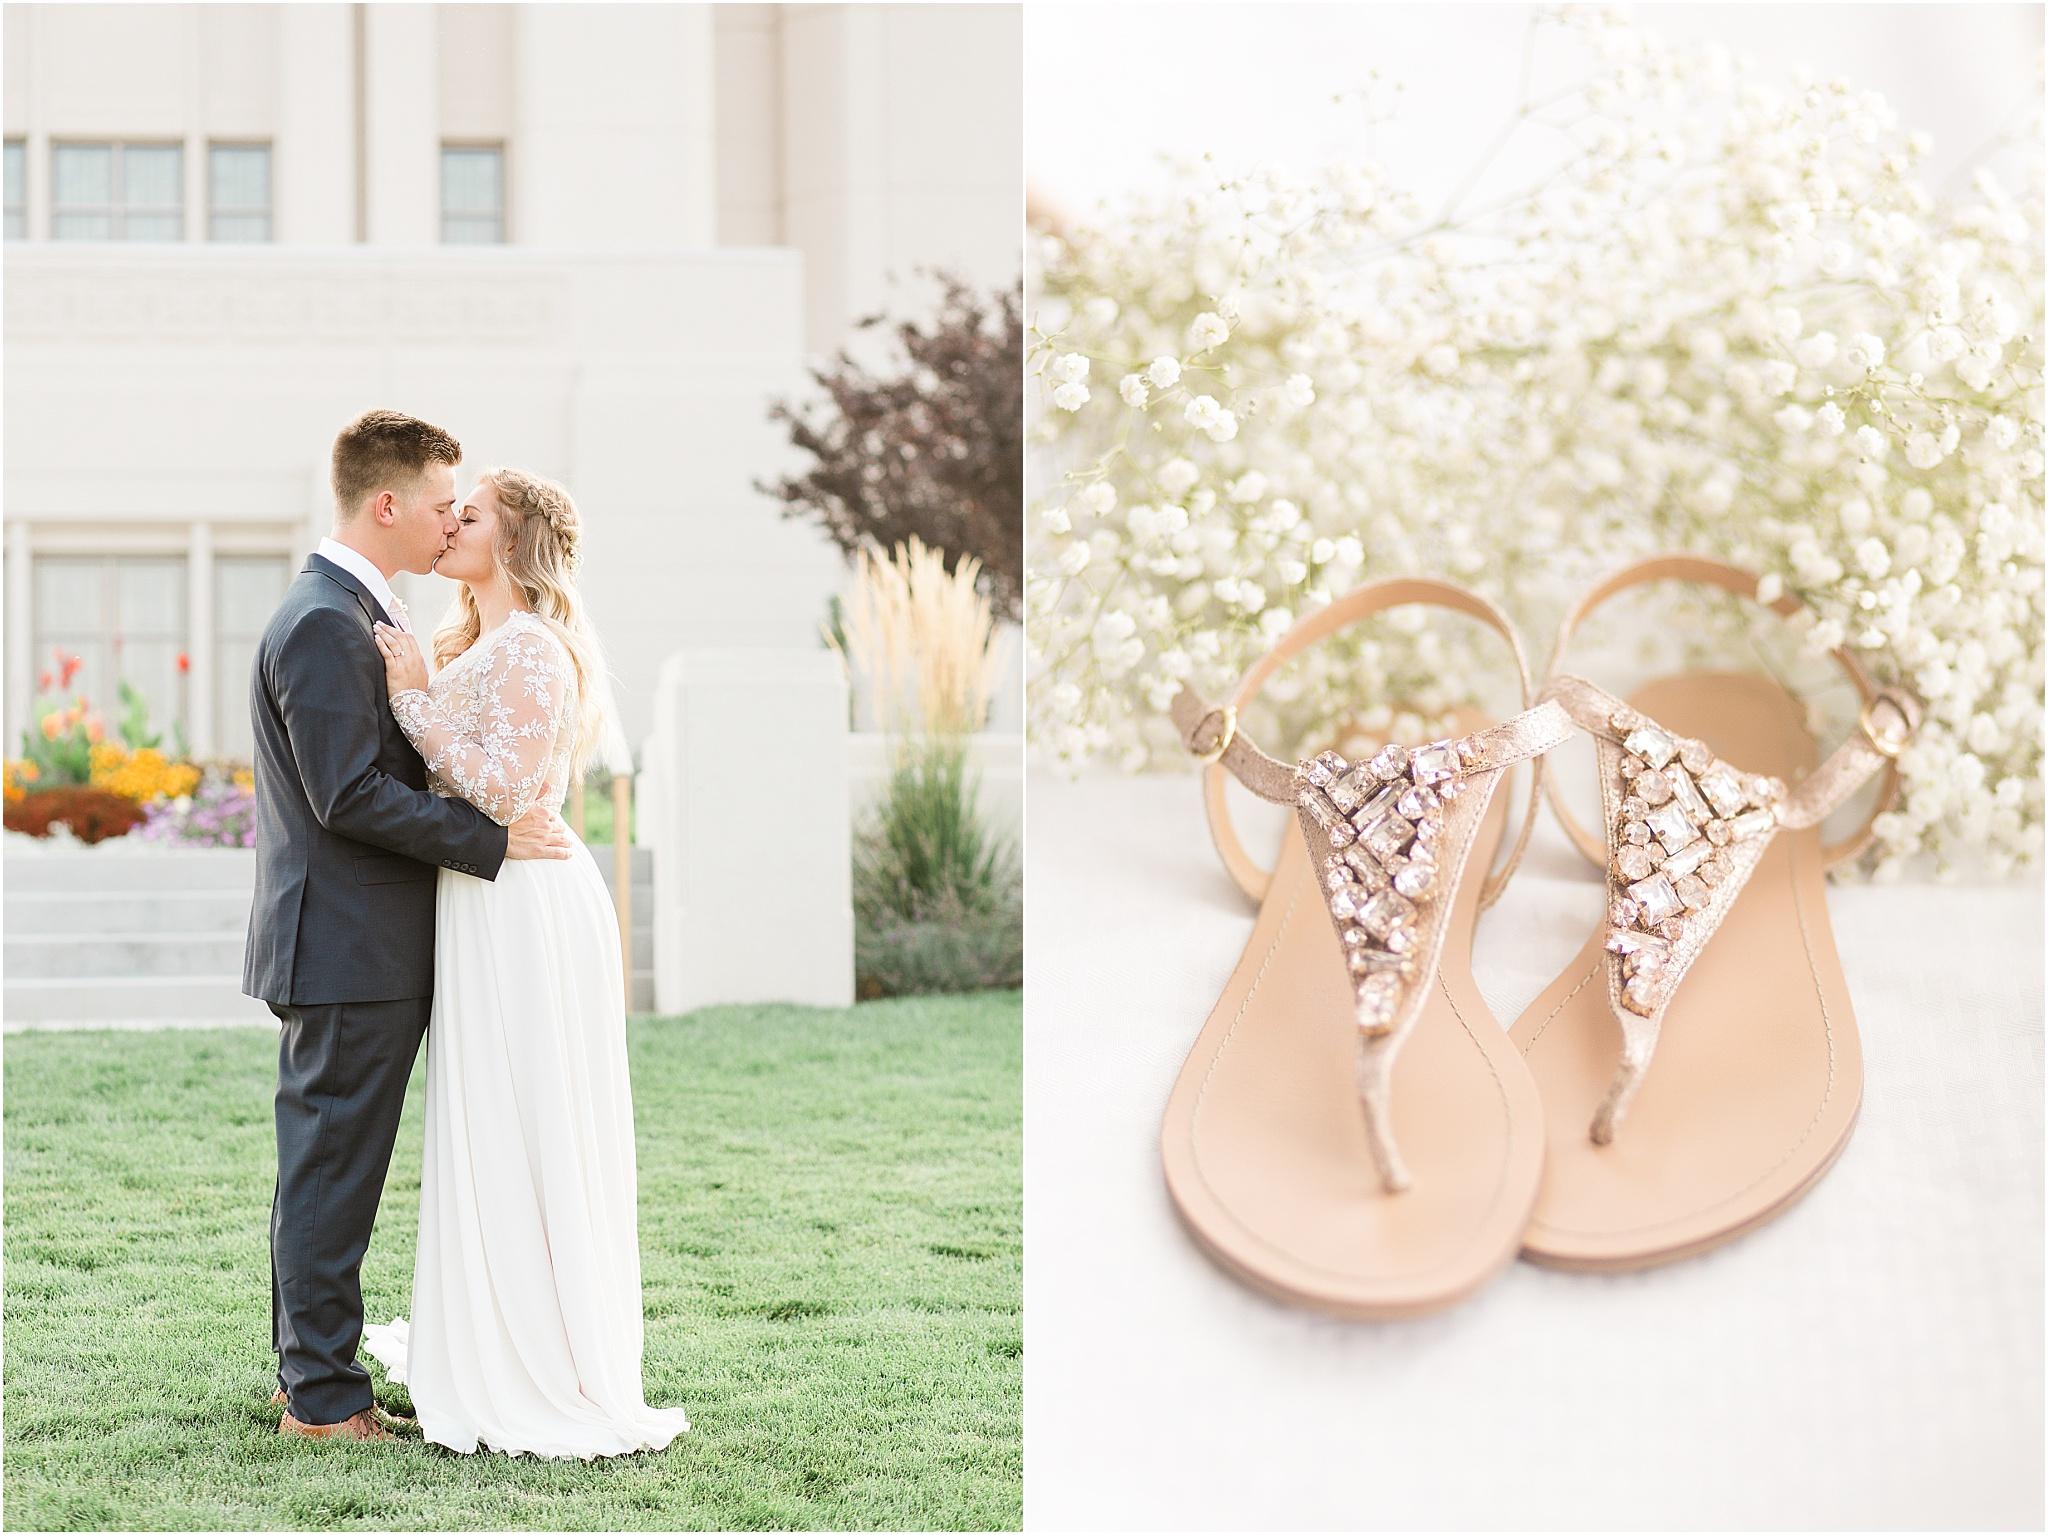 Wedding Photography_Meridian Idaho Temple_Boise Idaho_Nampa Idaho_Leah Southwick Photography_0004.jpg